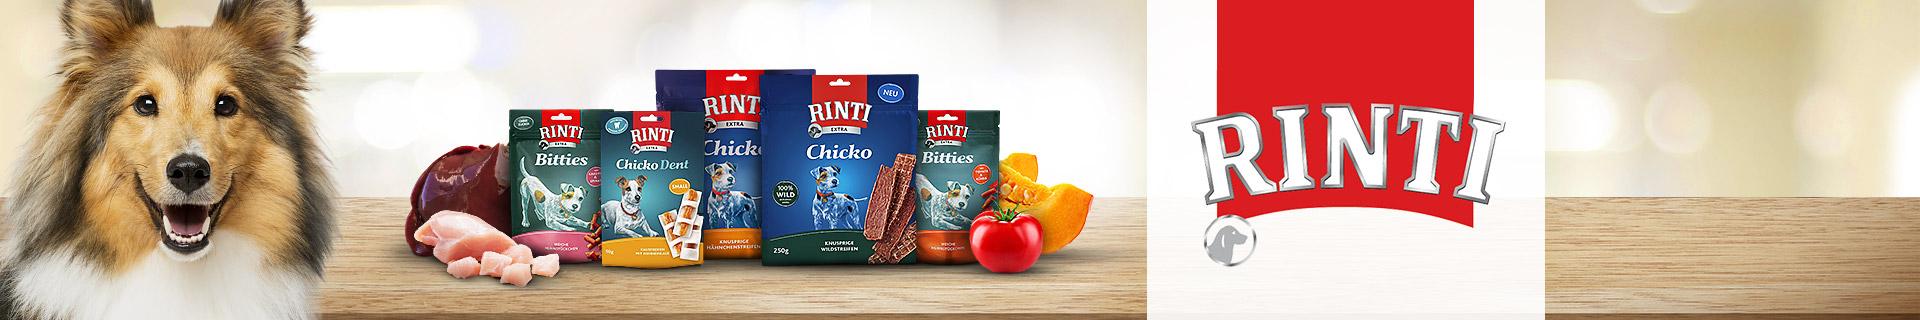 Rinti Hund Snacks Sensible